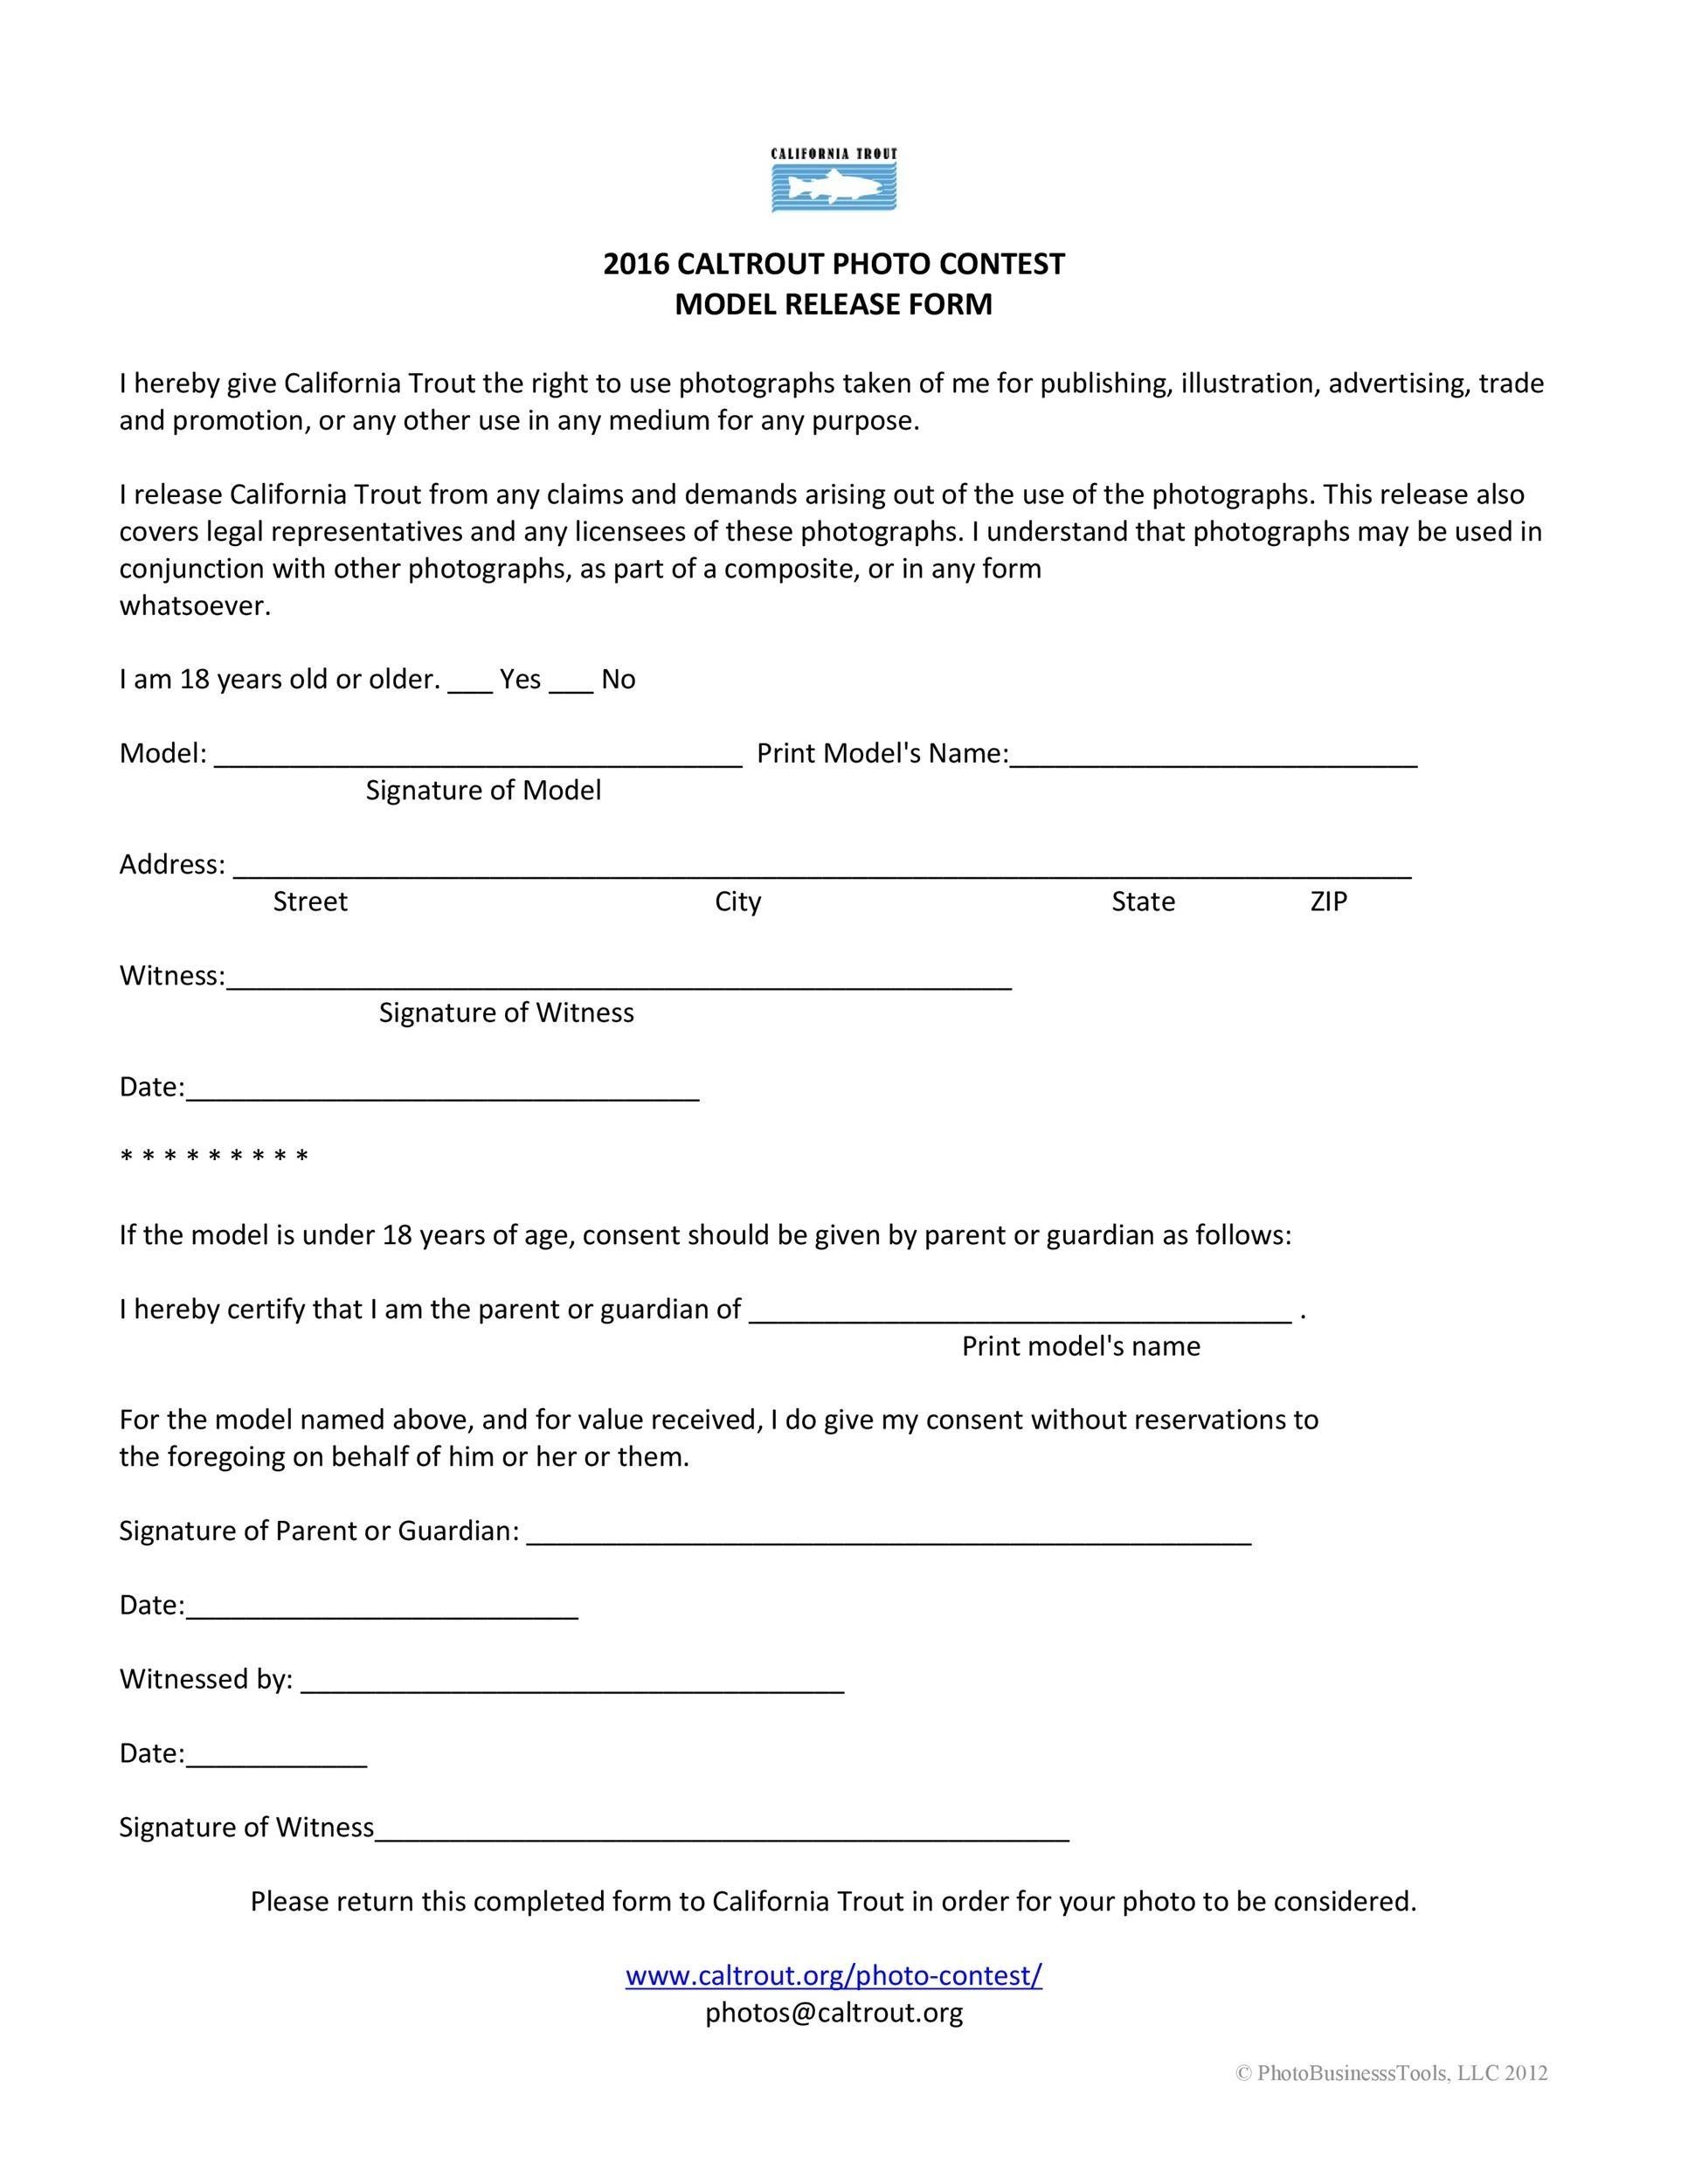 Free model release form 29